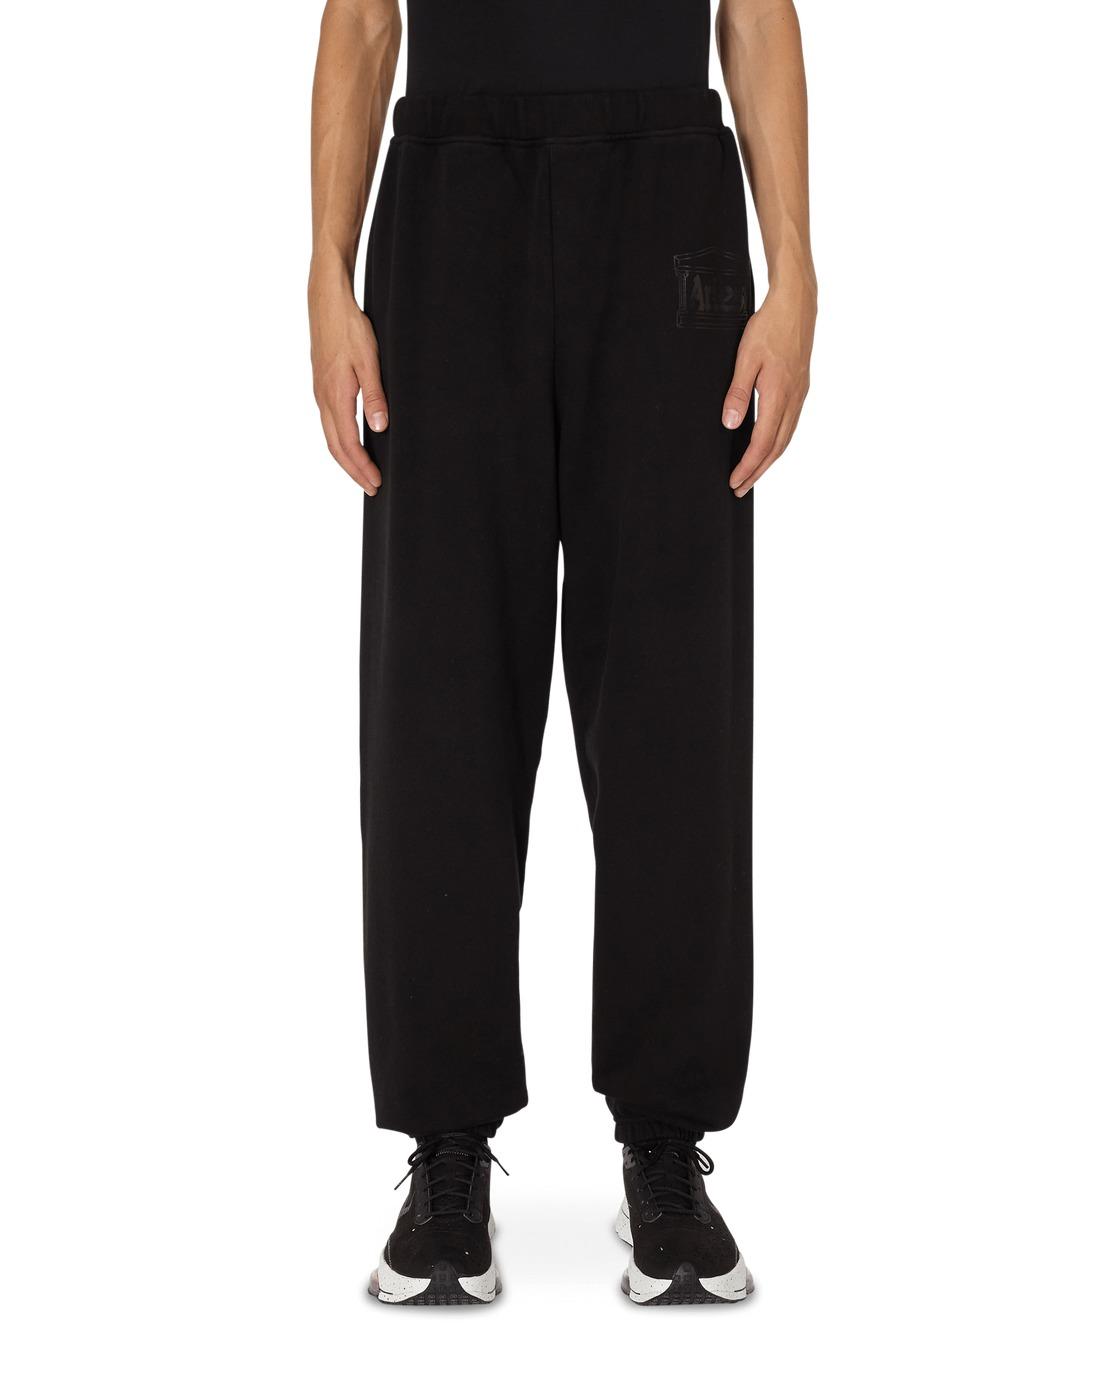 Aries Logo Premium Sweatpants Black